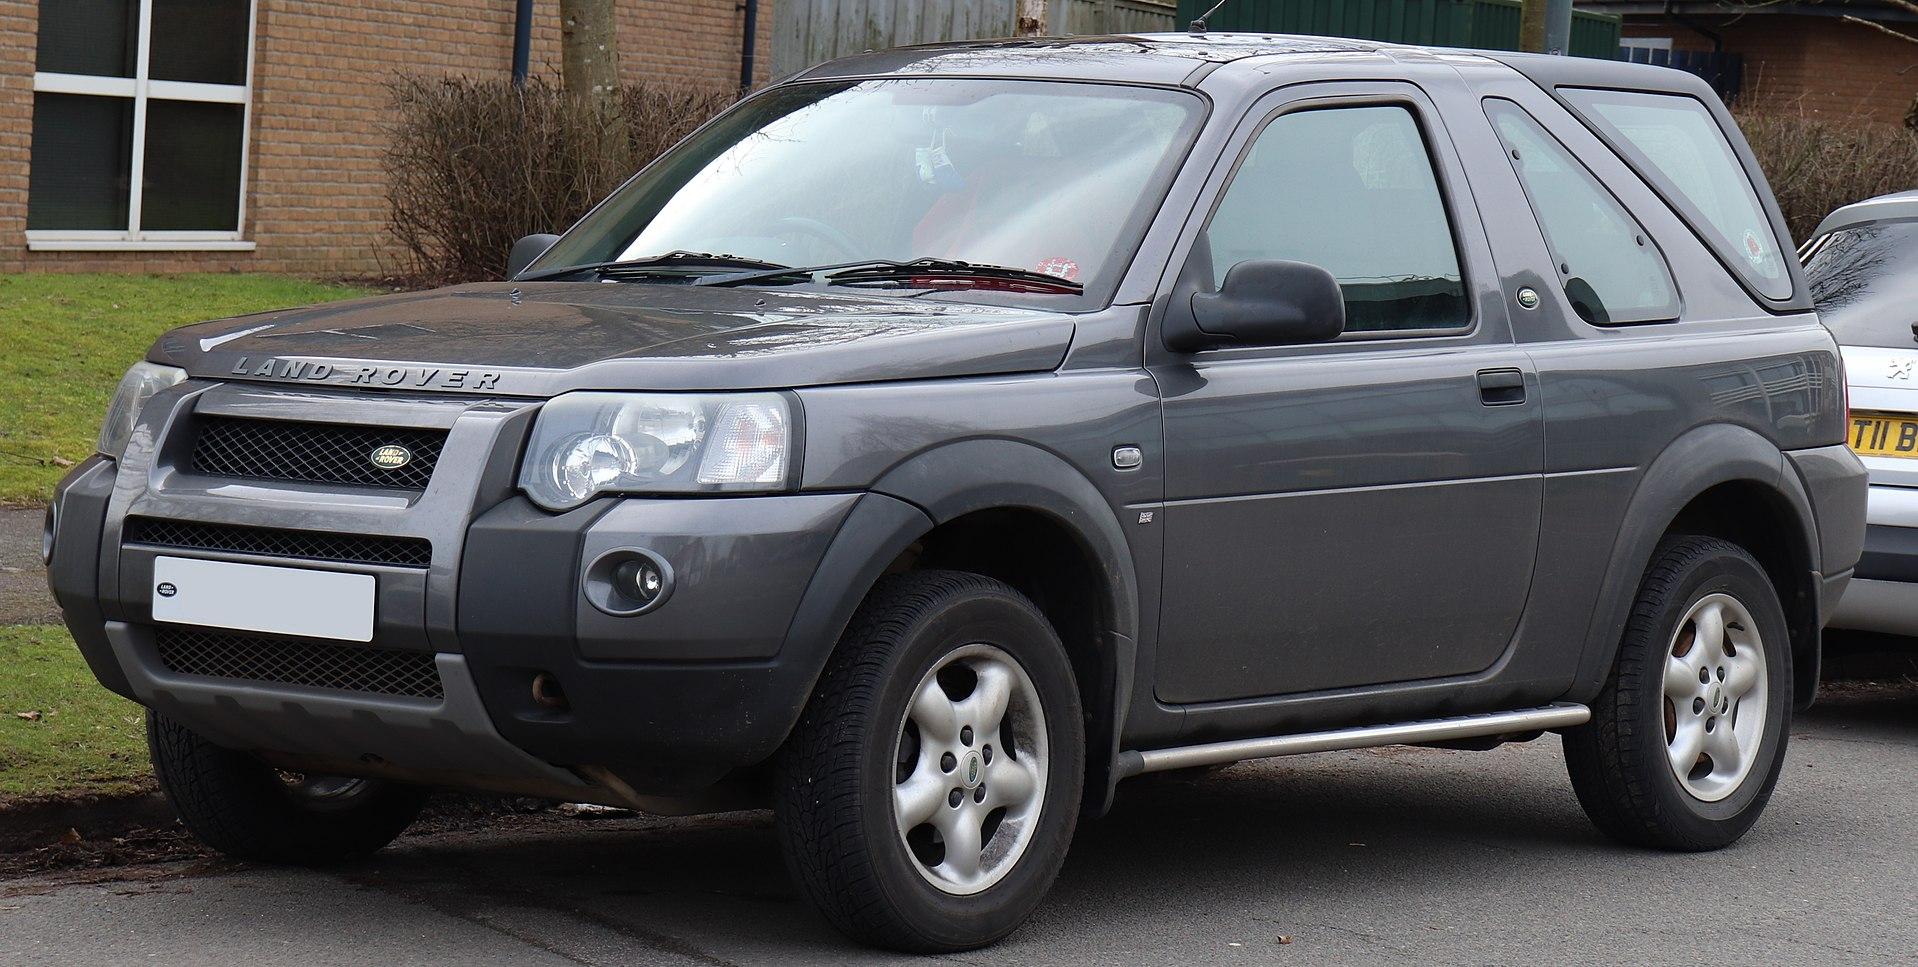 1920px-2007_Land_Rover_Freelander_TD_2.0